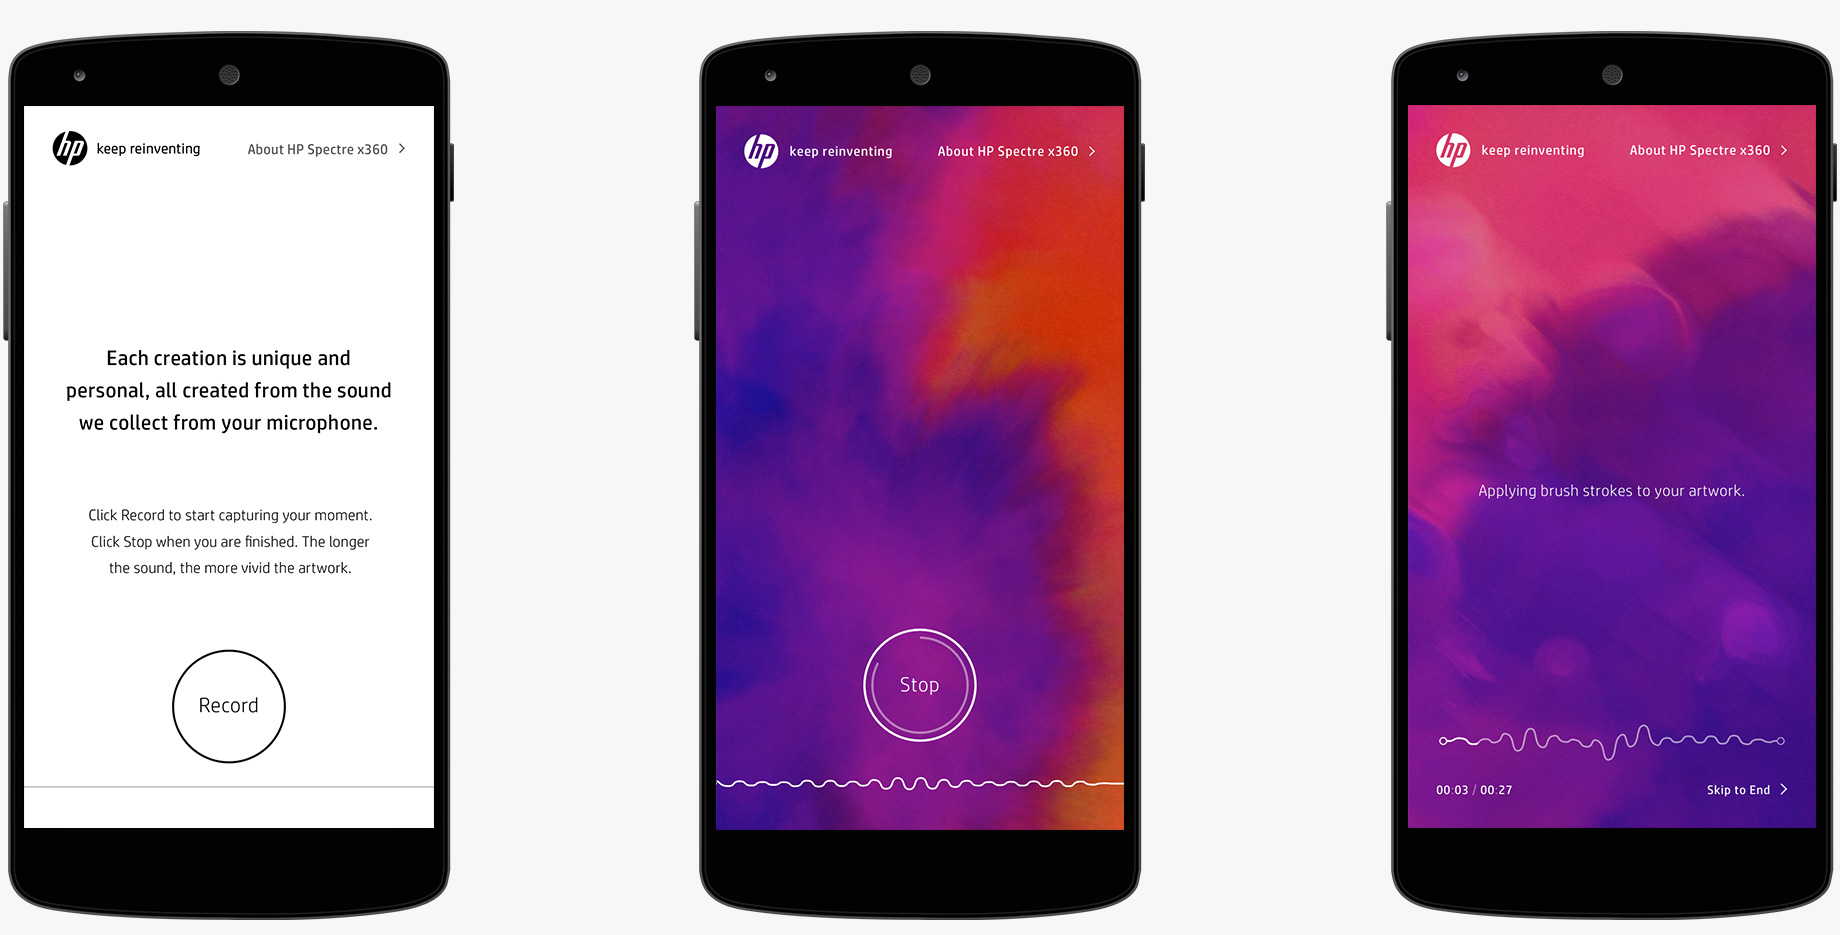 MBD-HP_Mobiles-1